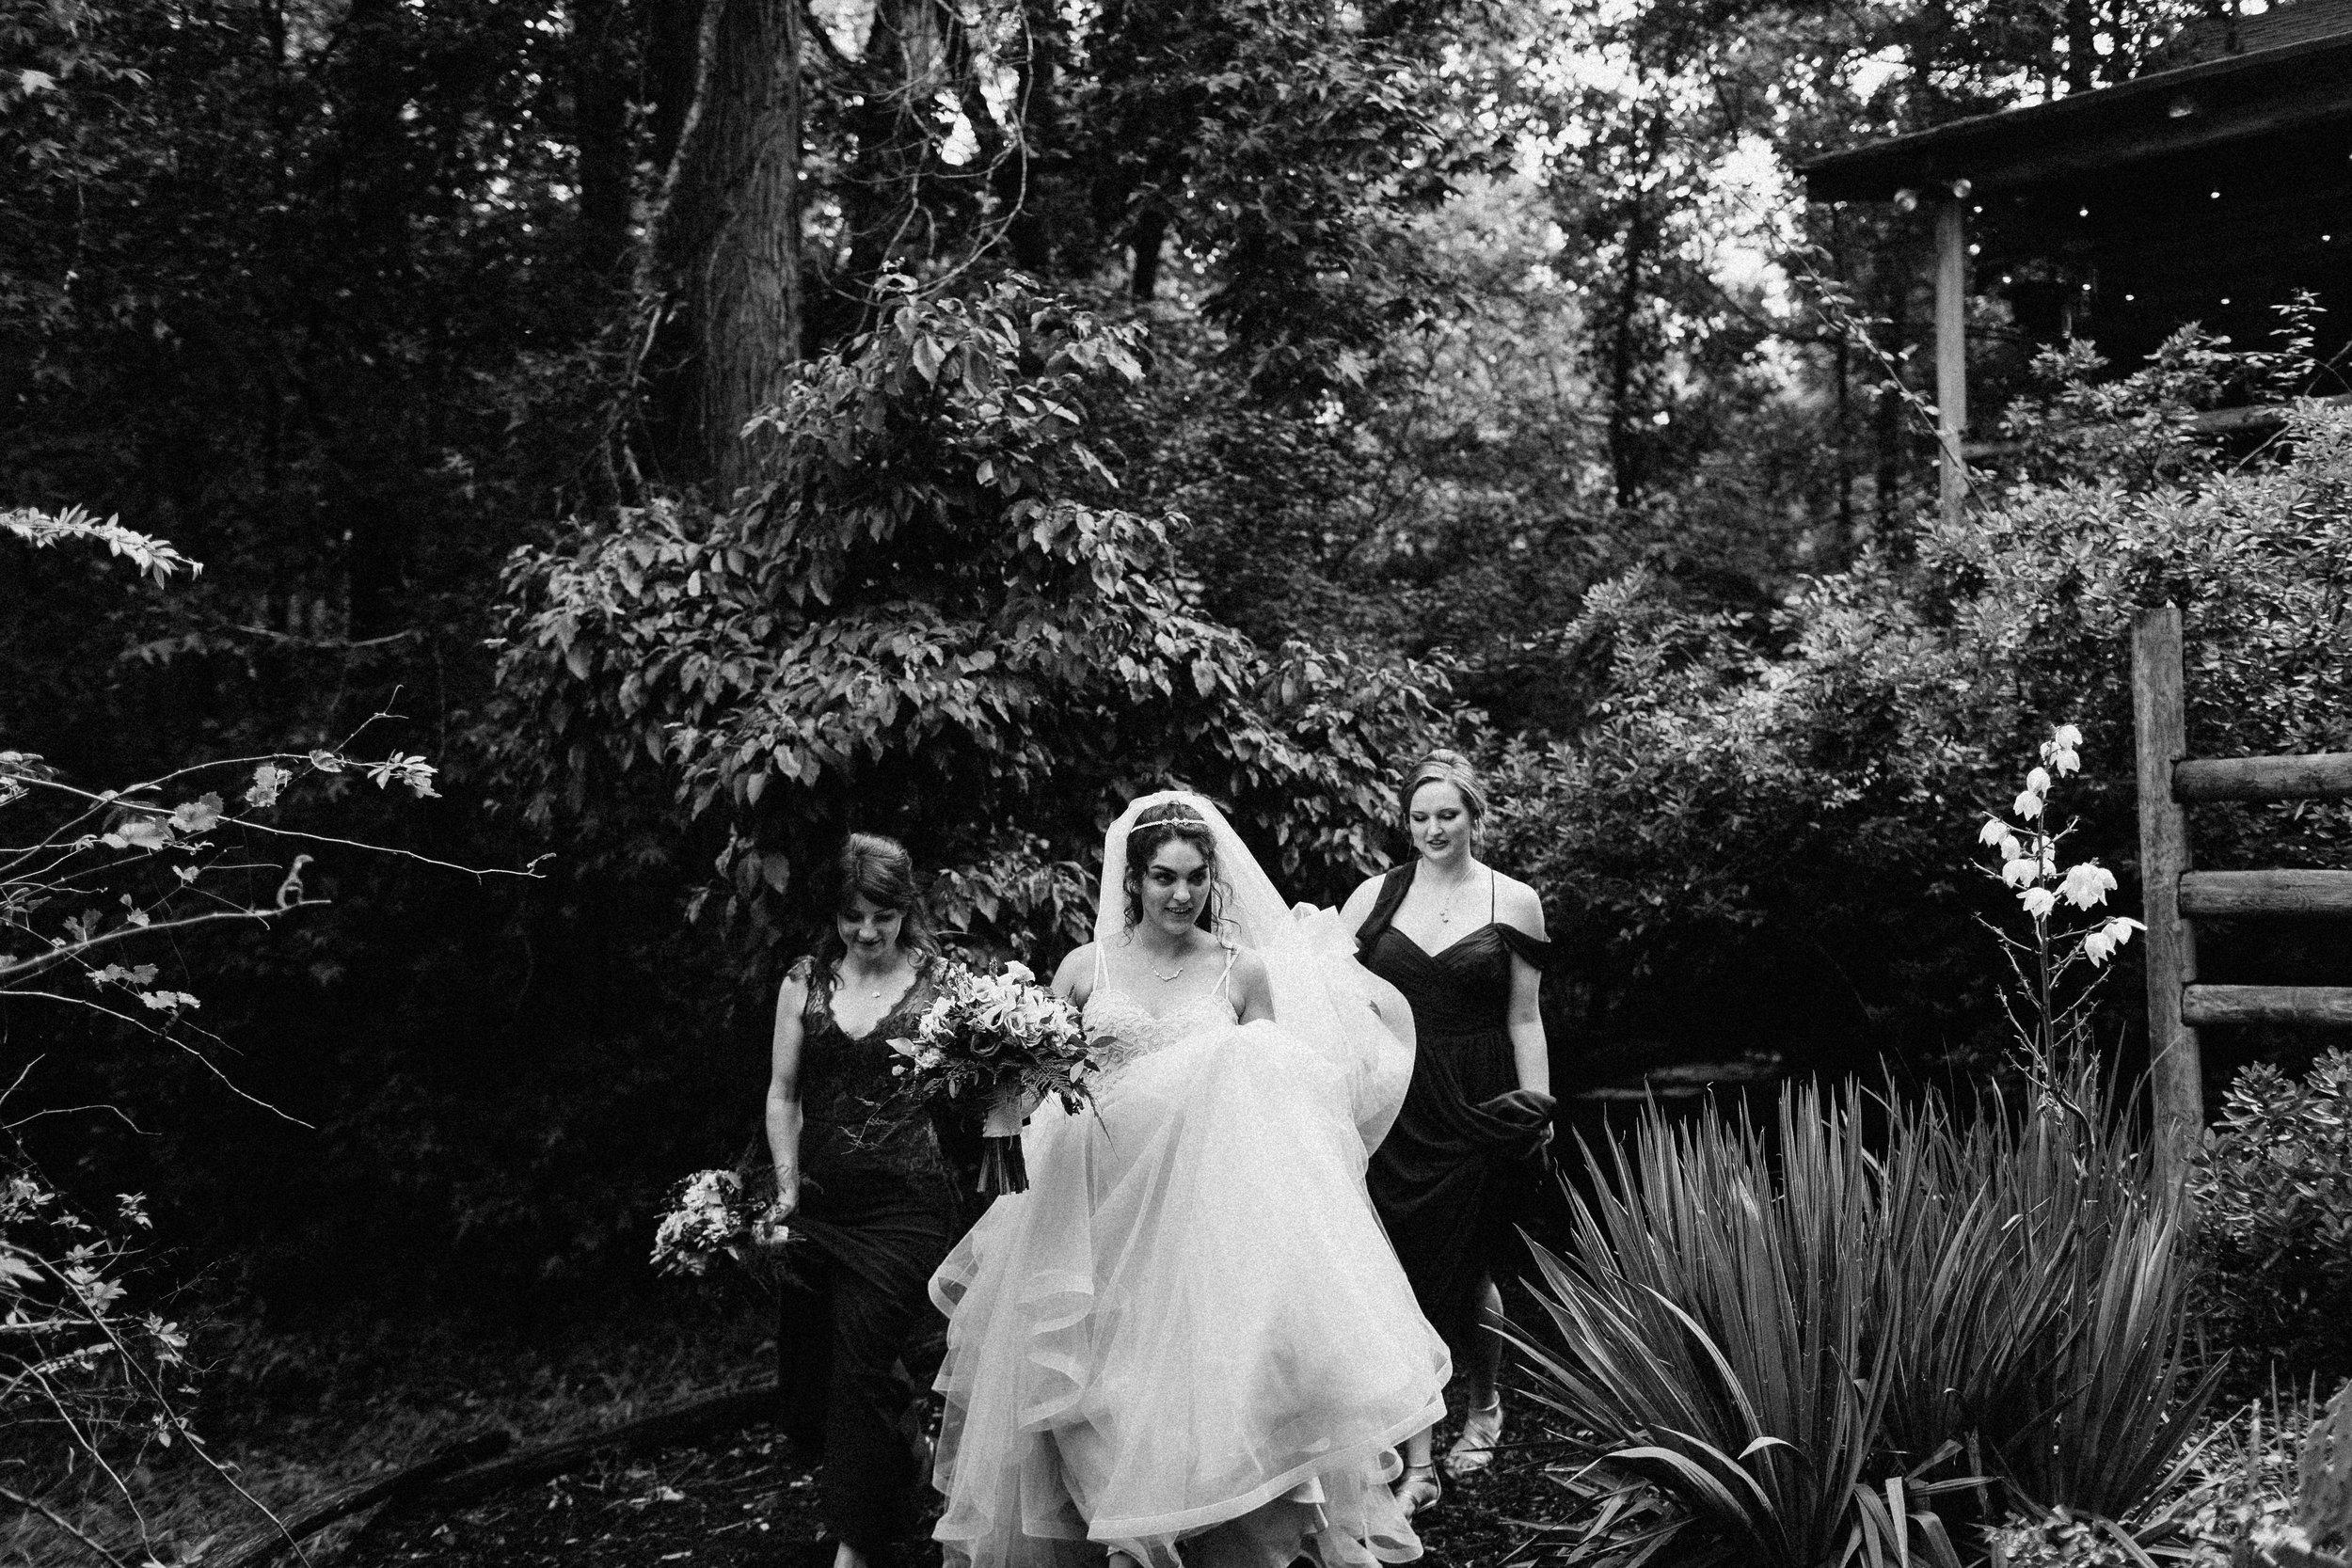 neverland_farms_atlanta_wedding_photographer_documentary_river_west_1326.jpg